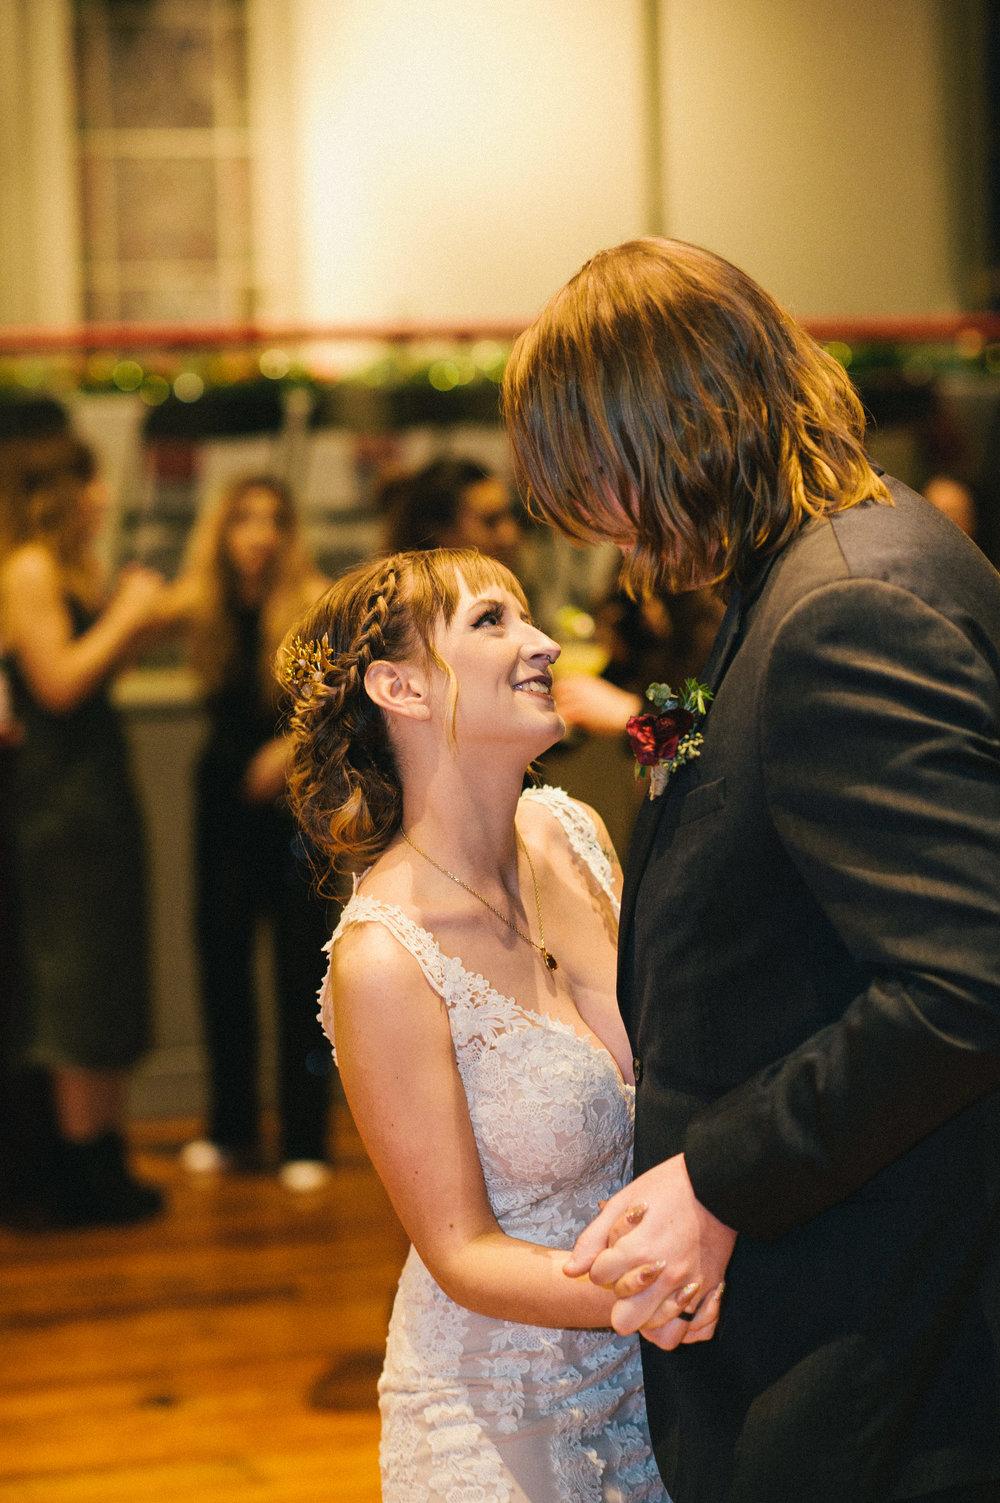 Amber and Kyles Wedding 49.jpg